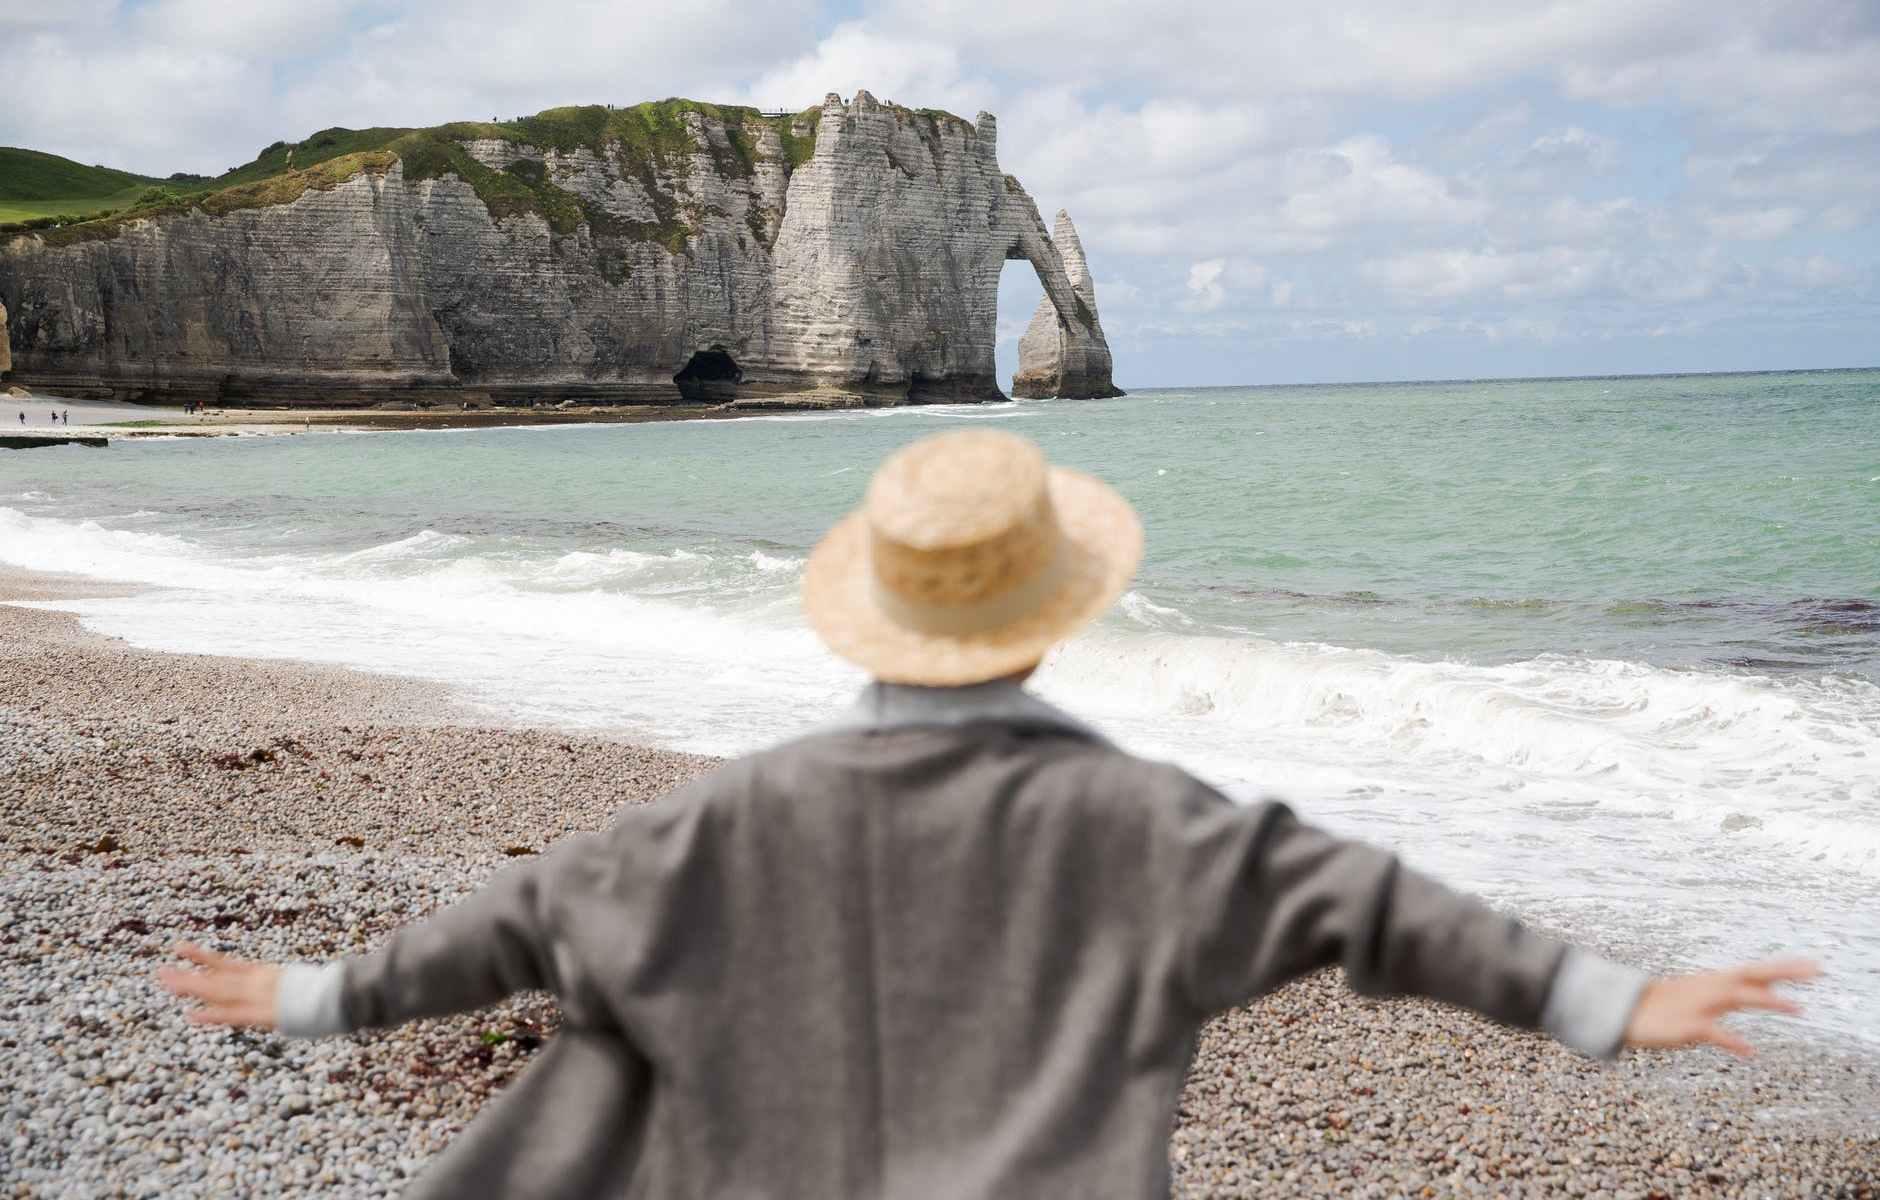 unrecognizable traveler in hat on shore near wavy sea